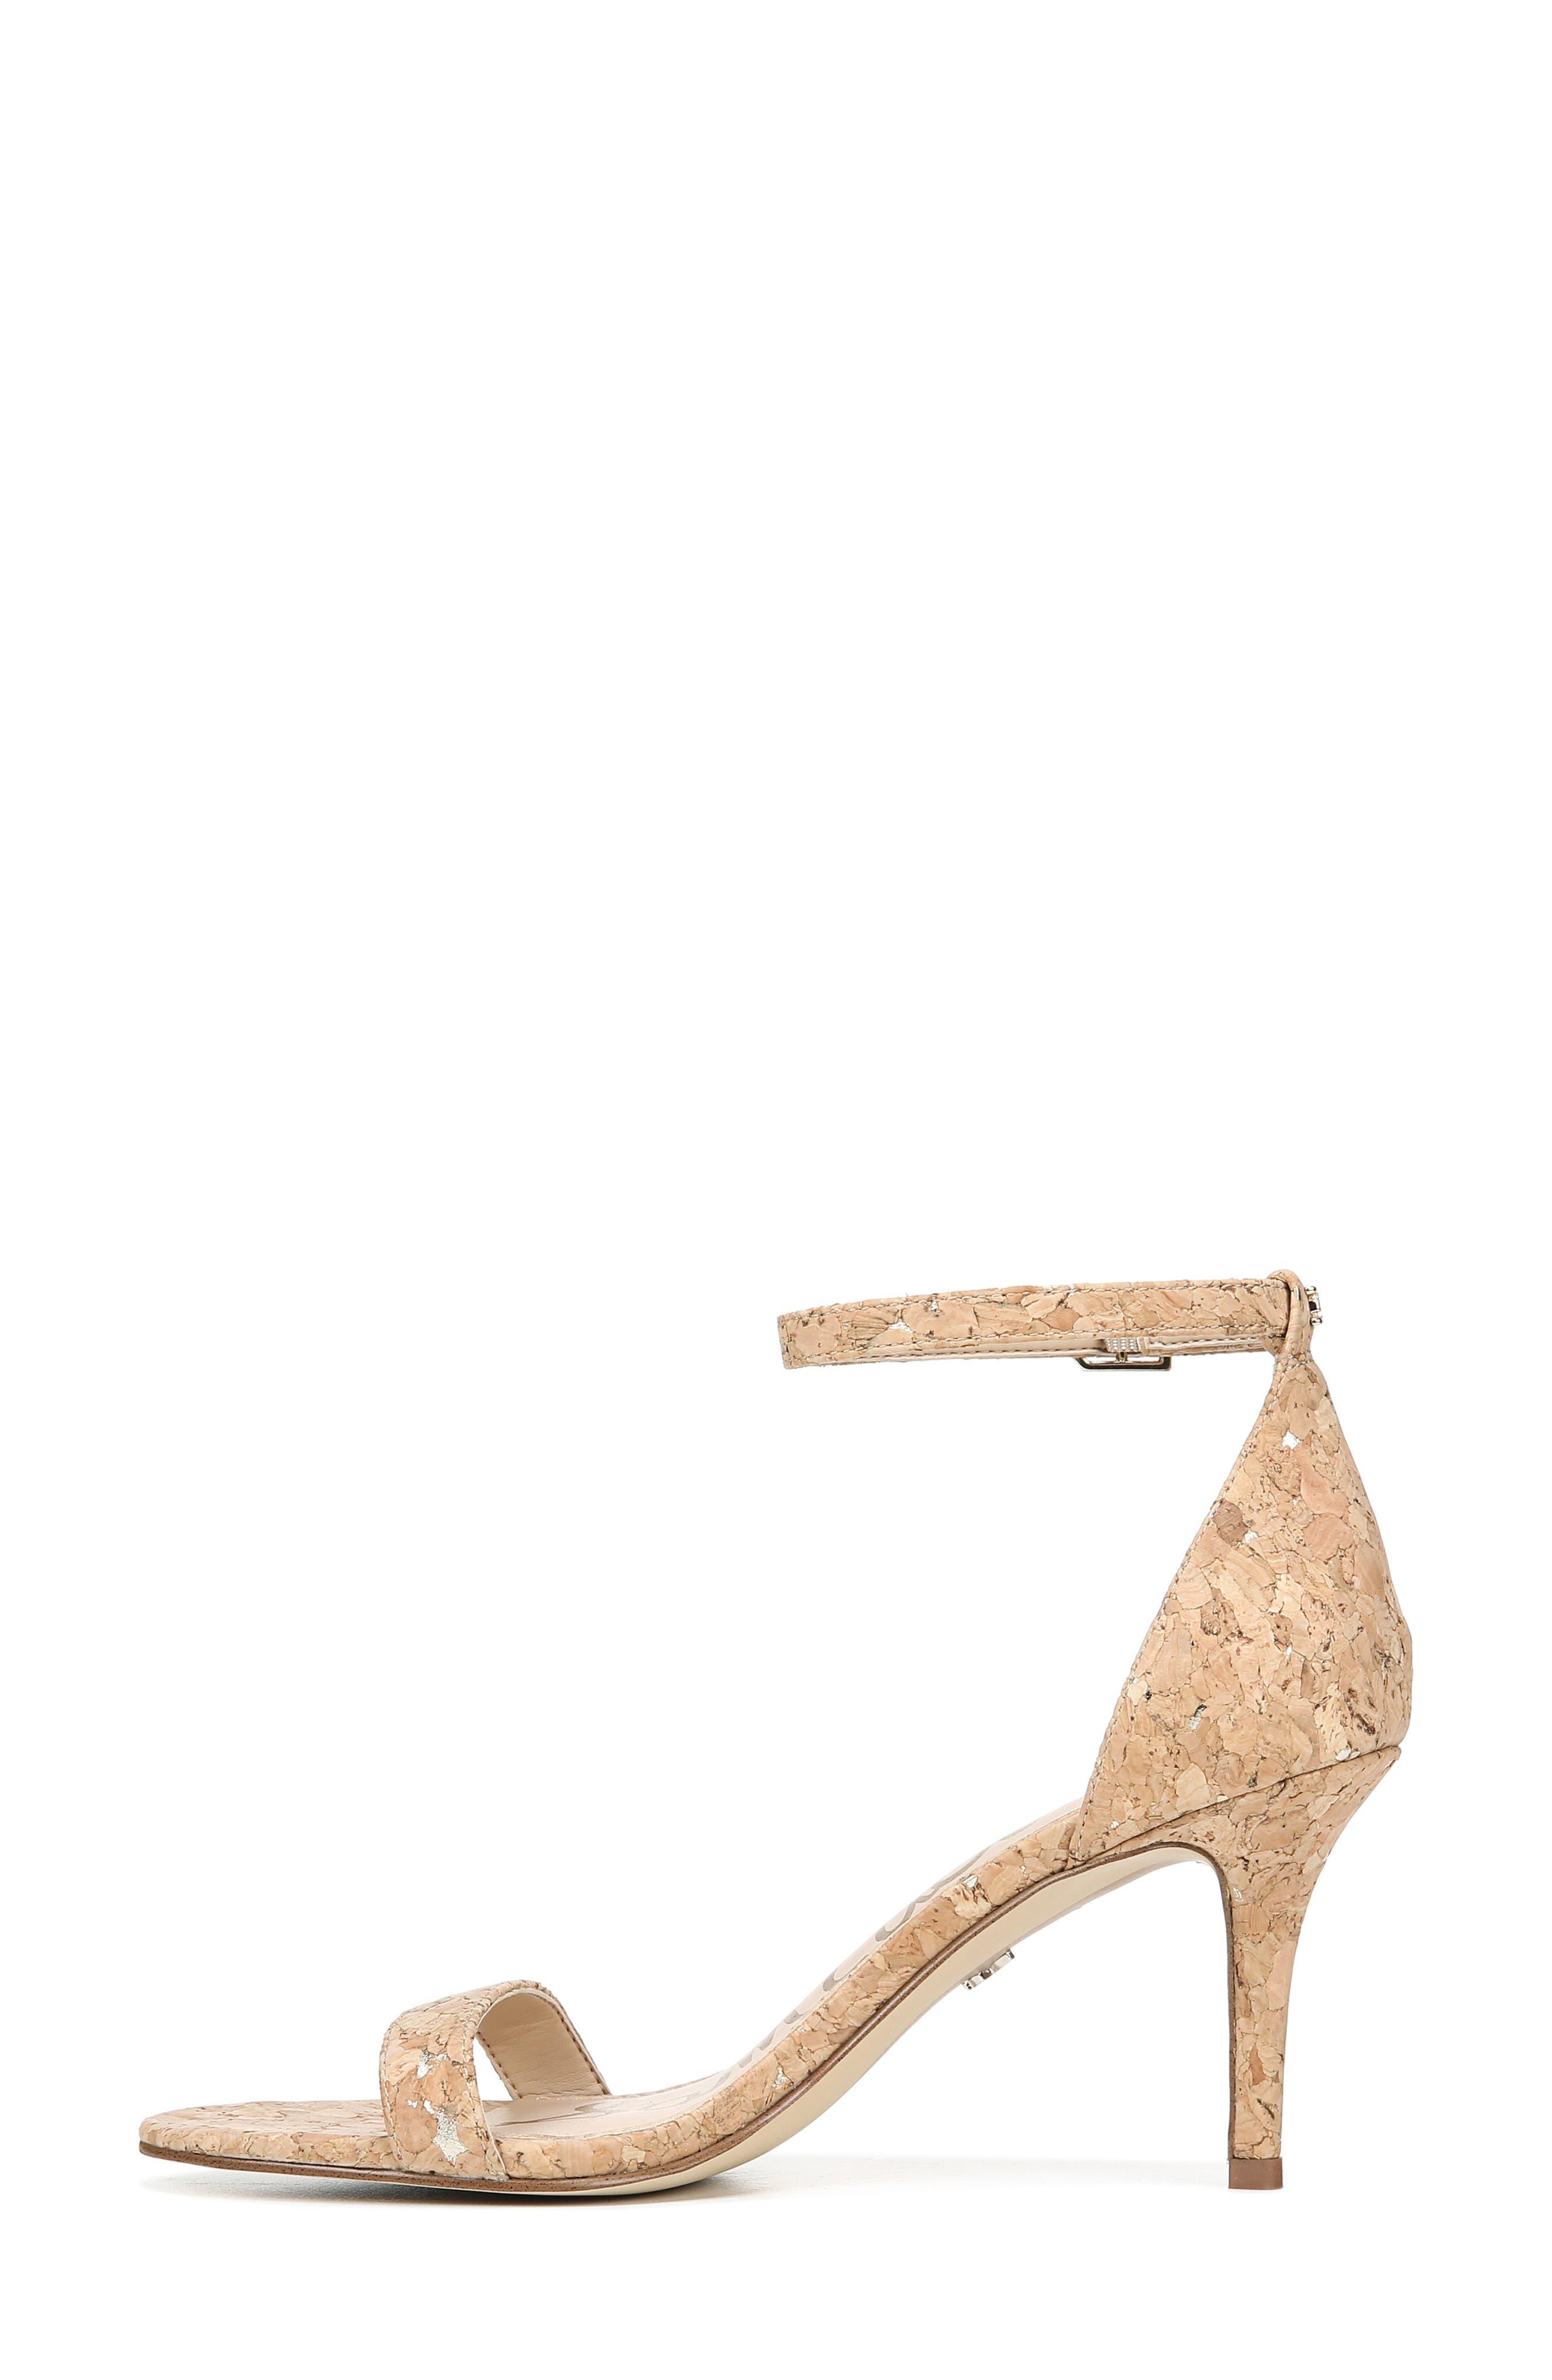 ,                             'Patti' Ankle Strap Sandal,                             Alternate thumbnail 87, color,                             251